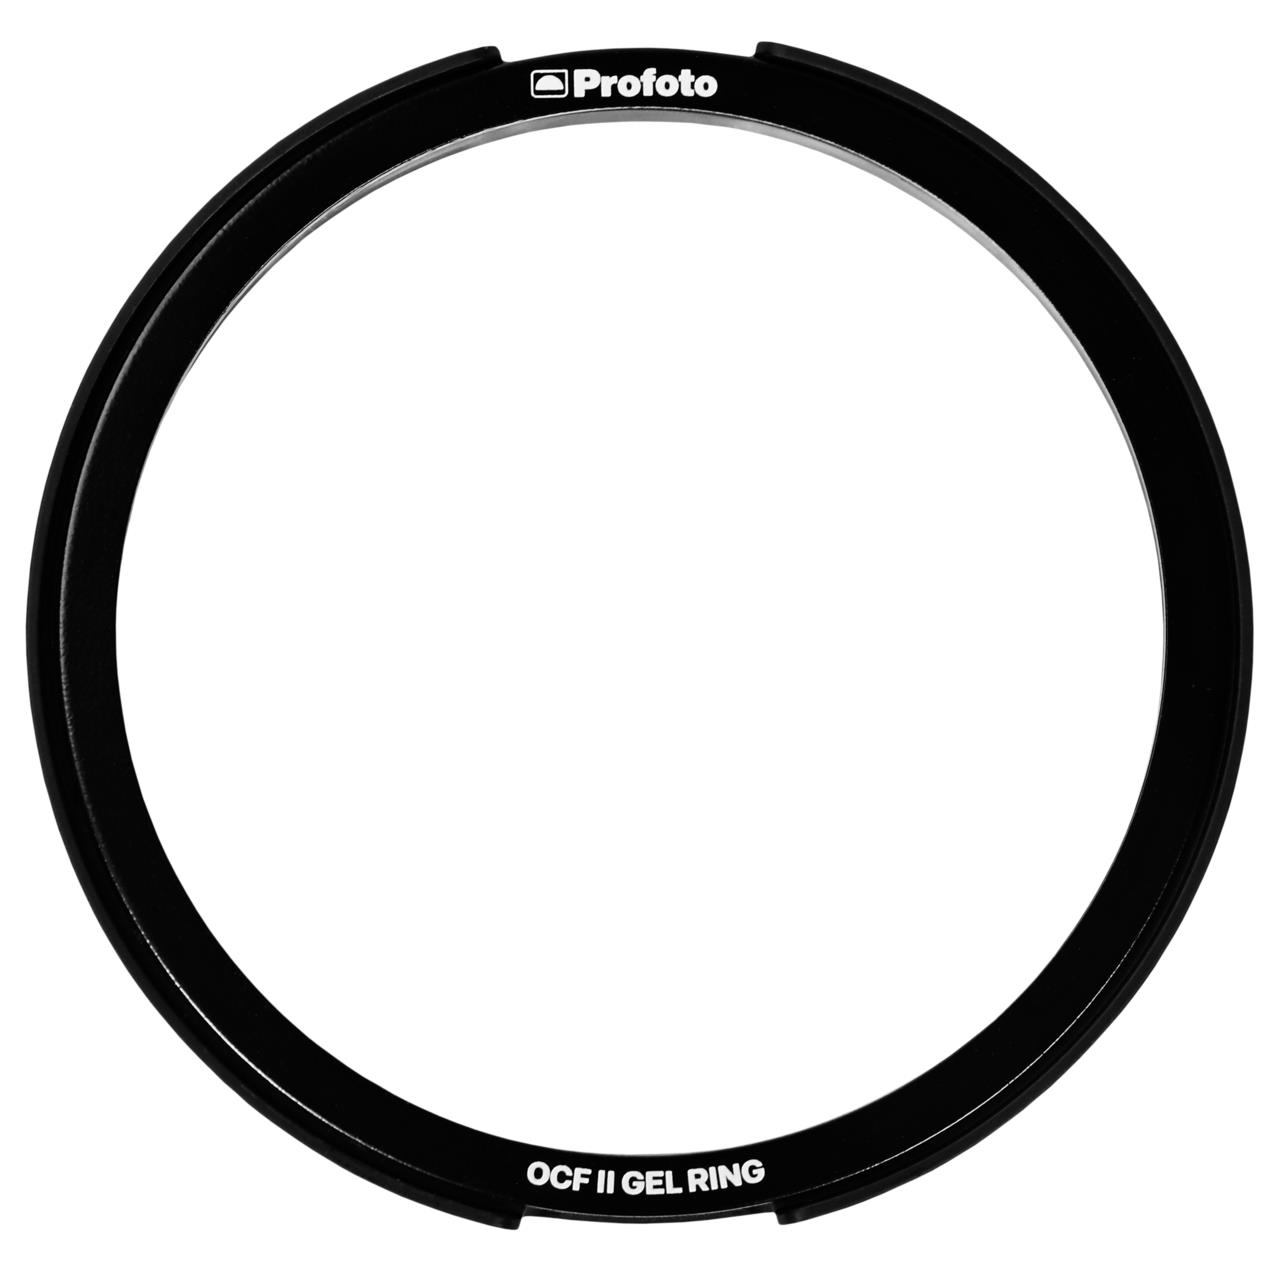 Profoto OCF II Gel - Ring